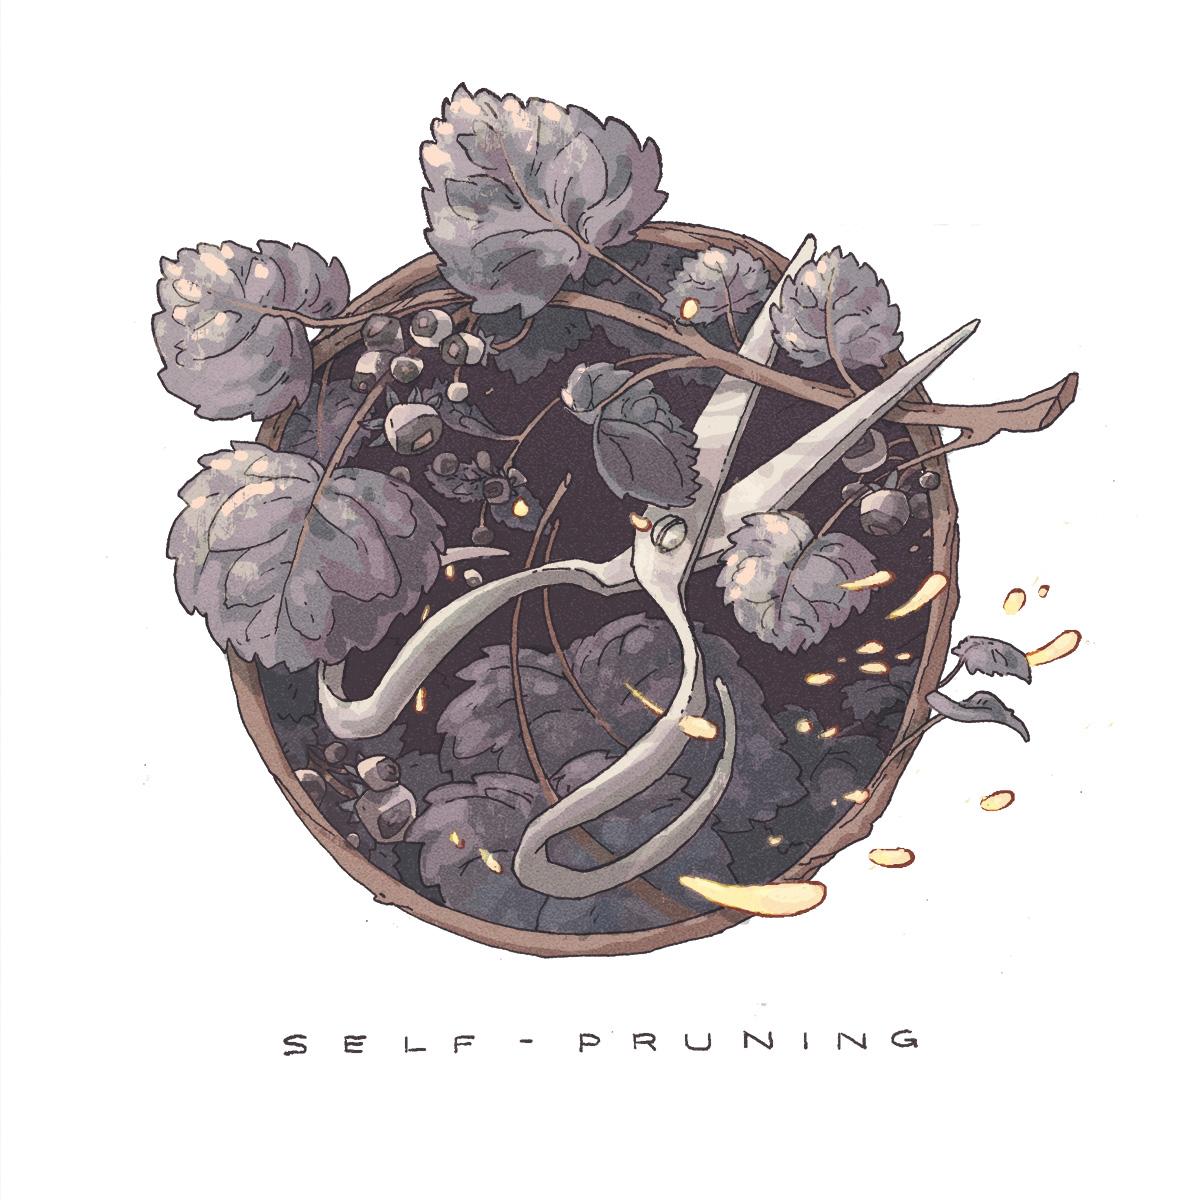 Self-Pruning